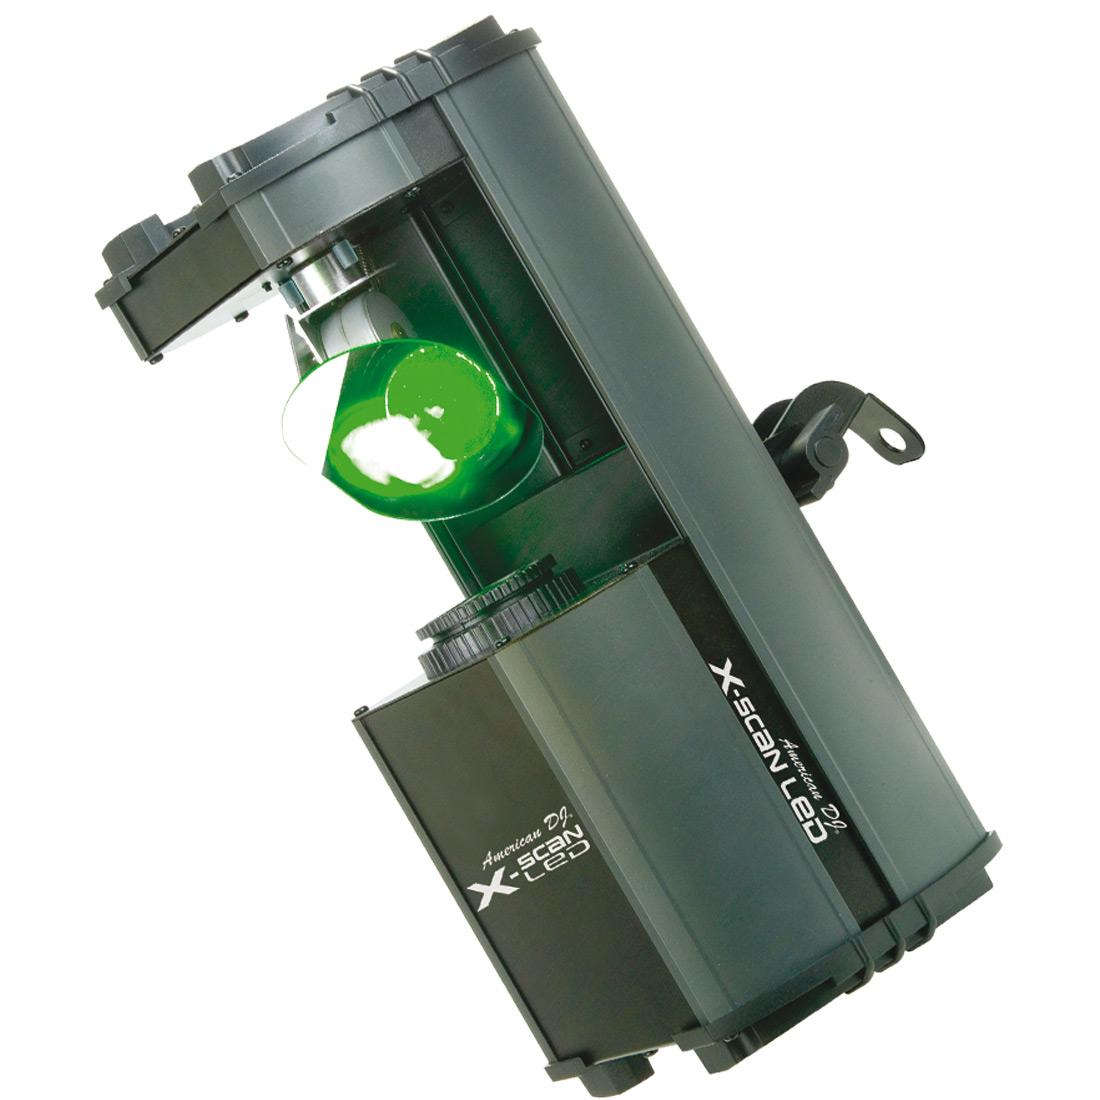 X-Scan LED